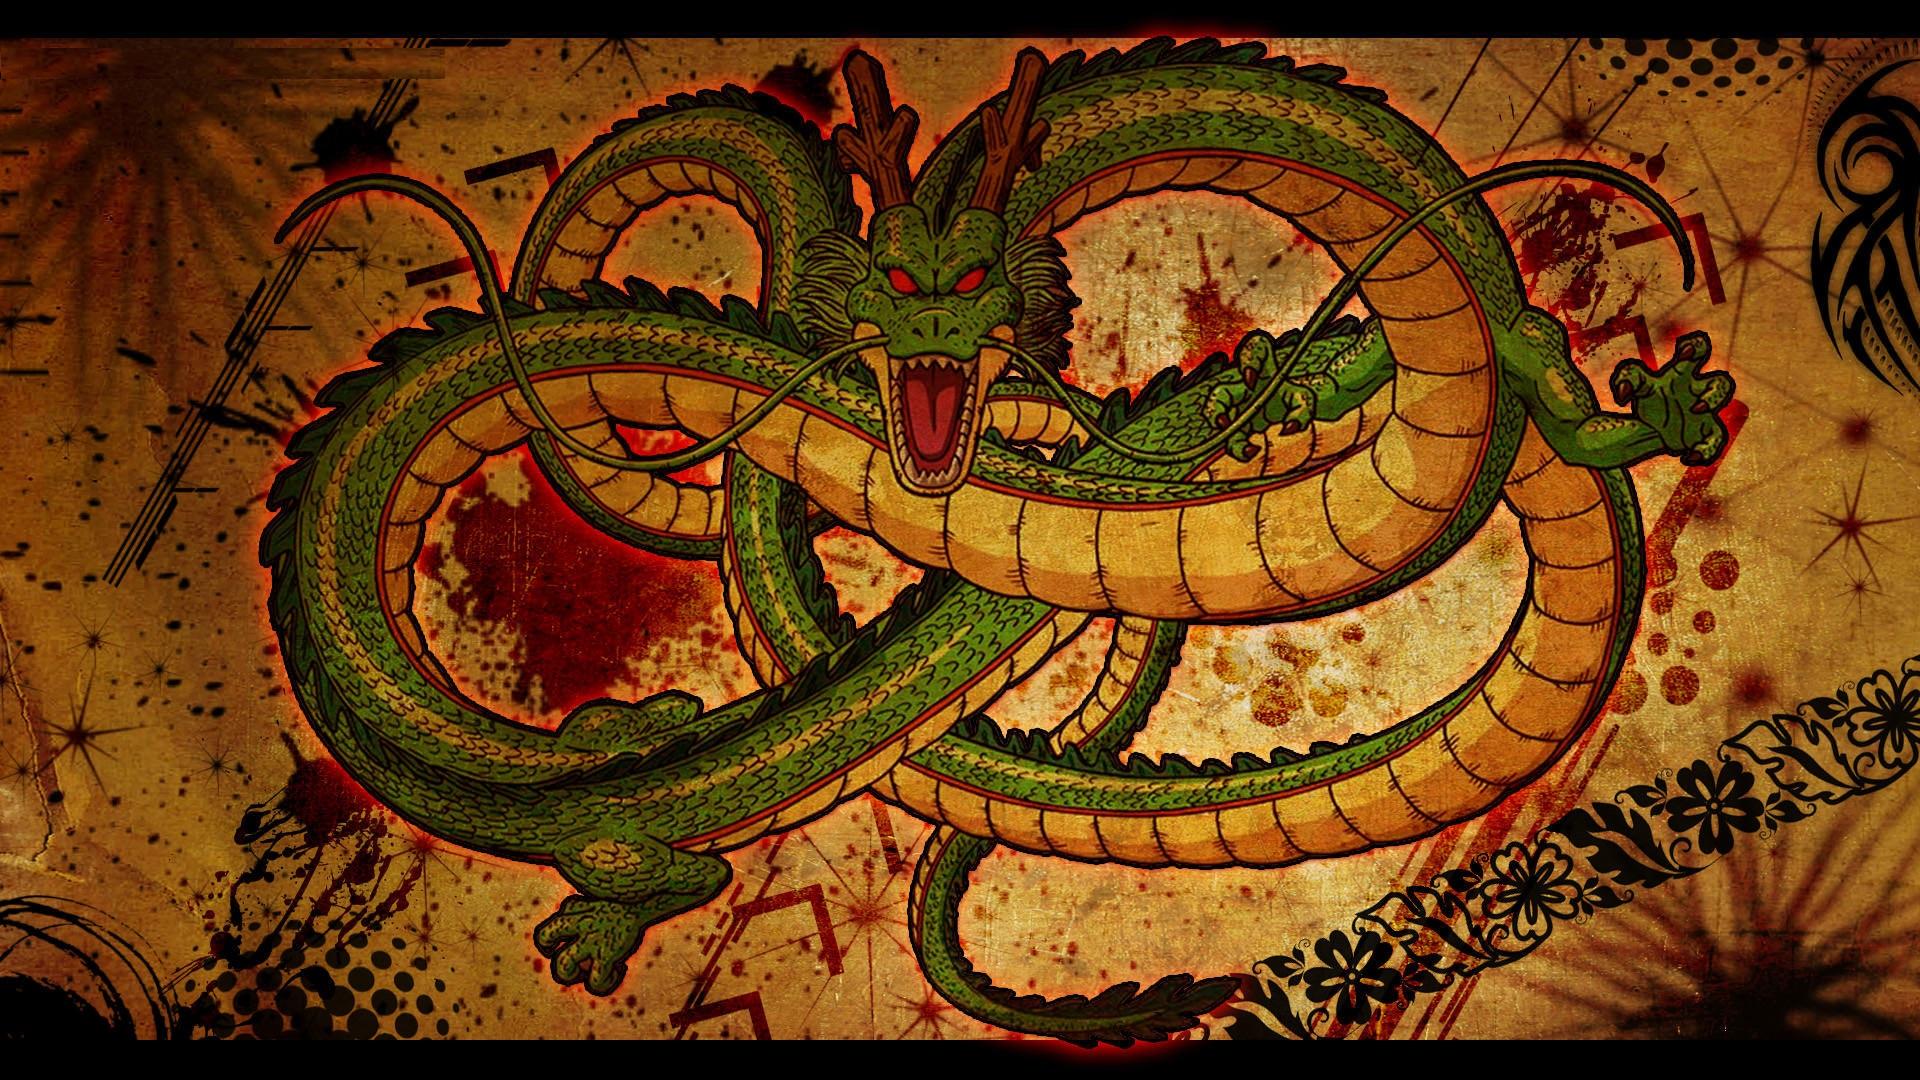 Chinese Dragon Wallpaper Hd Chinese Dragon Wallpaper 1920x1080 Media File